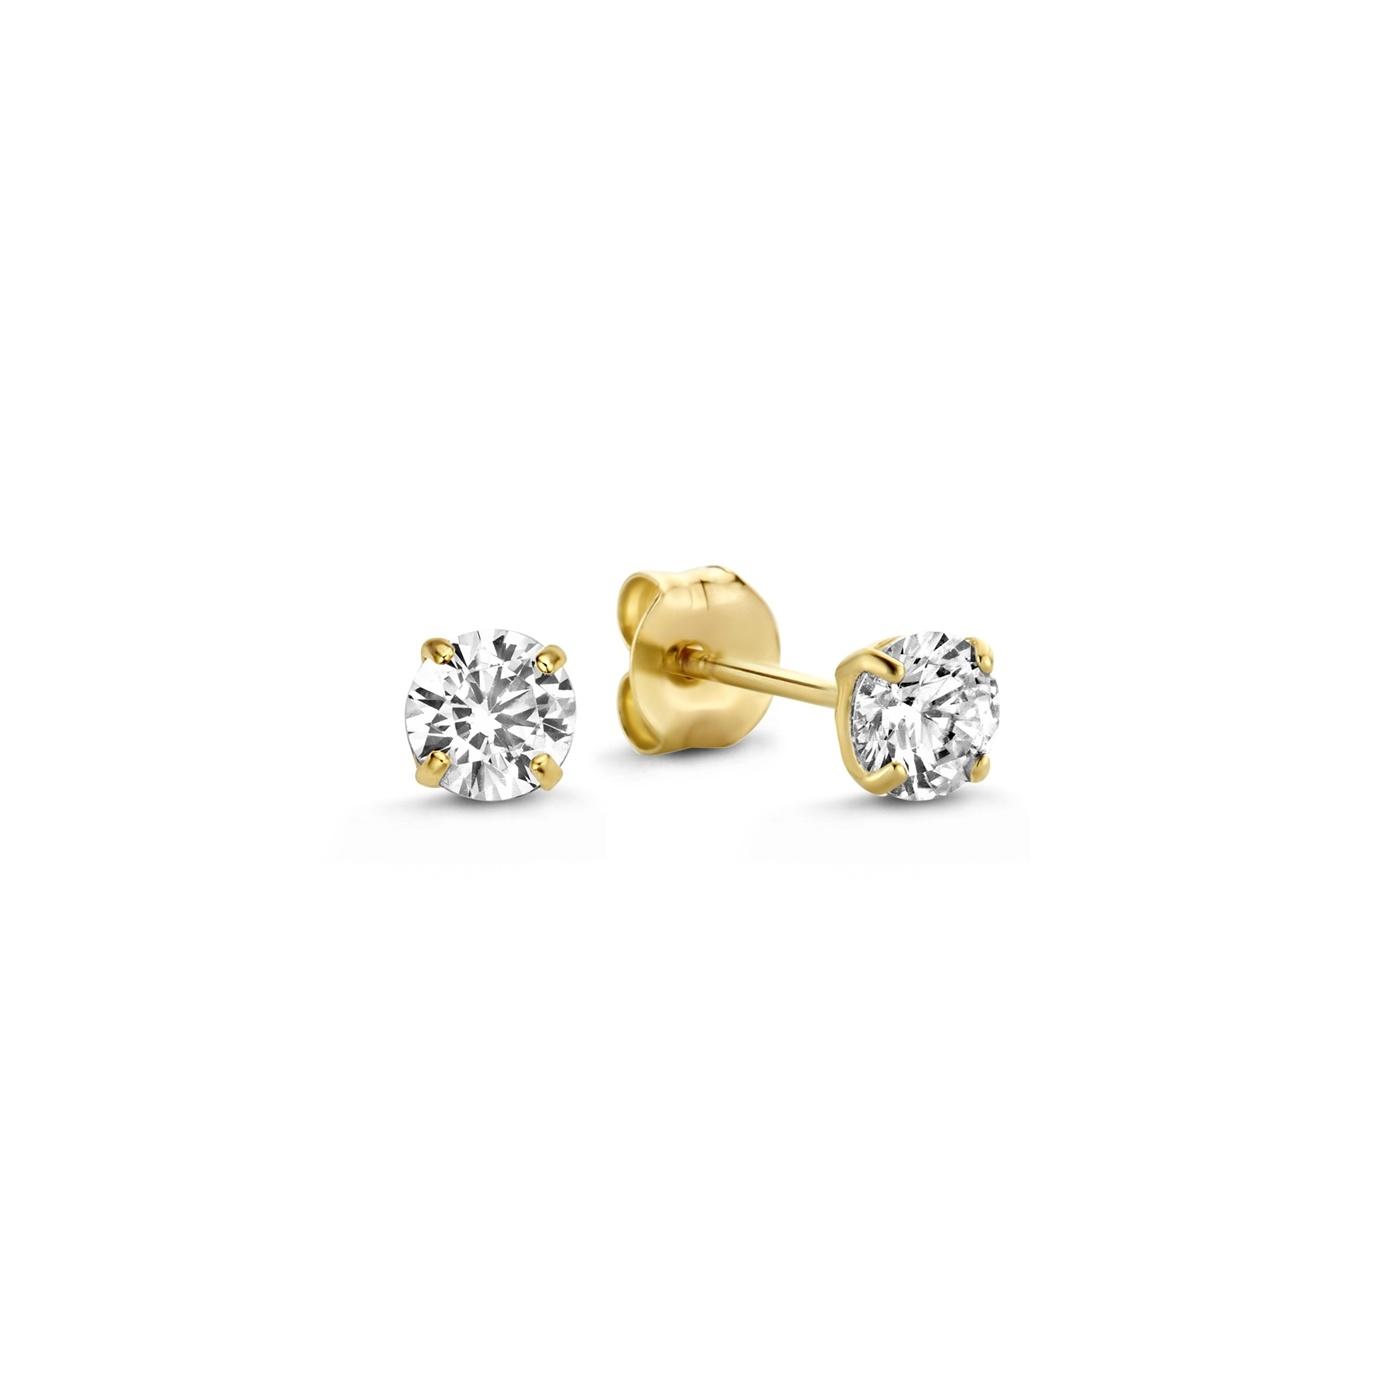 Isabel Bernard Le Marais Lourdes 14 karat gold ear studs with zirconia